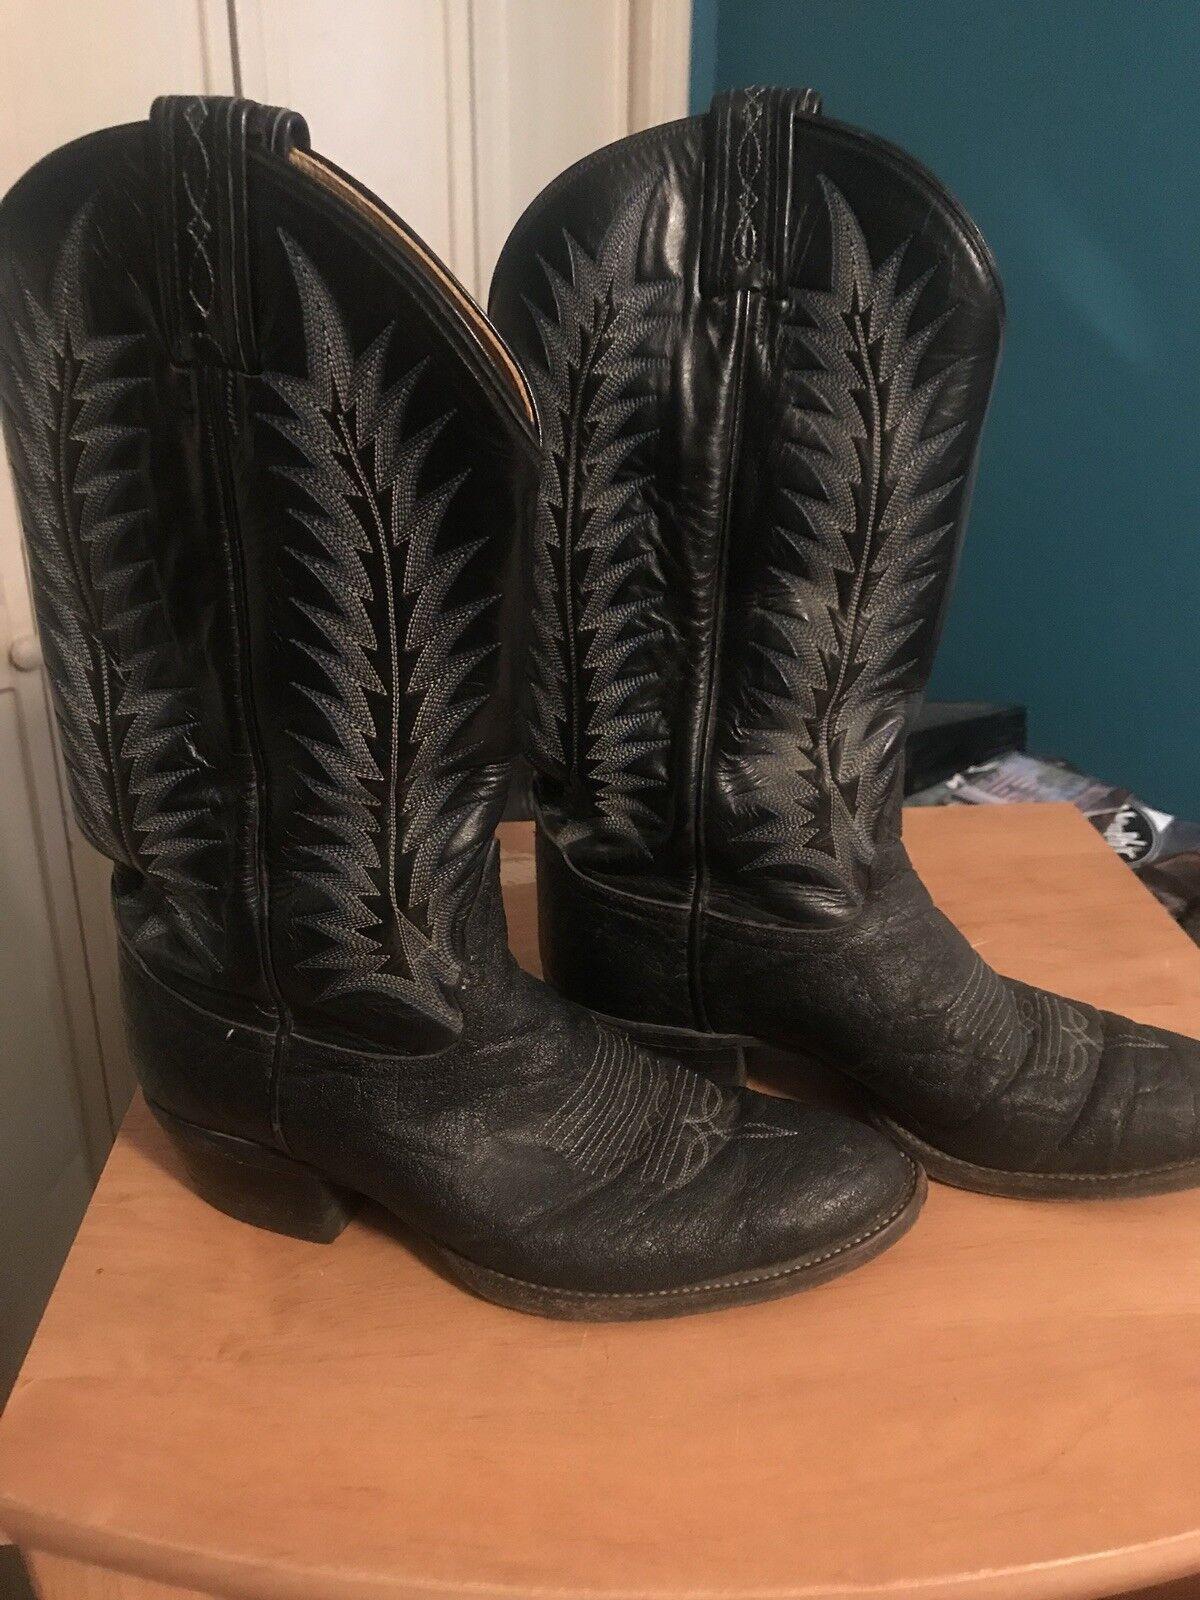 Women's Tony Alamo Cowboy Boots Size 8